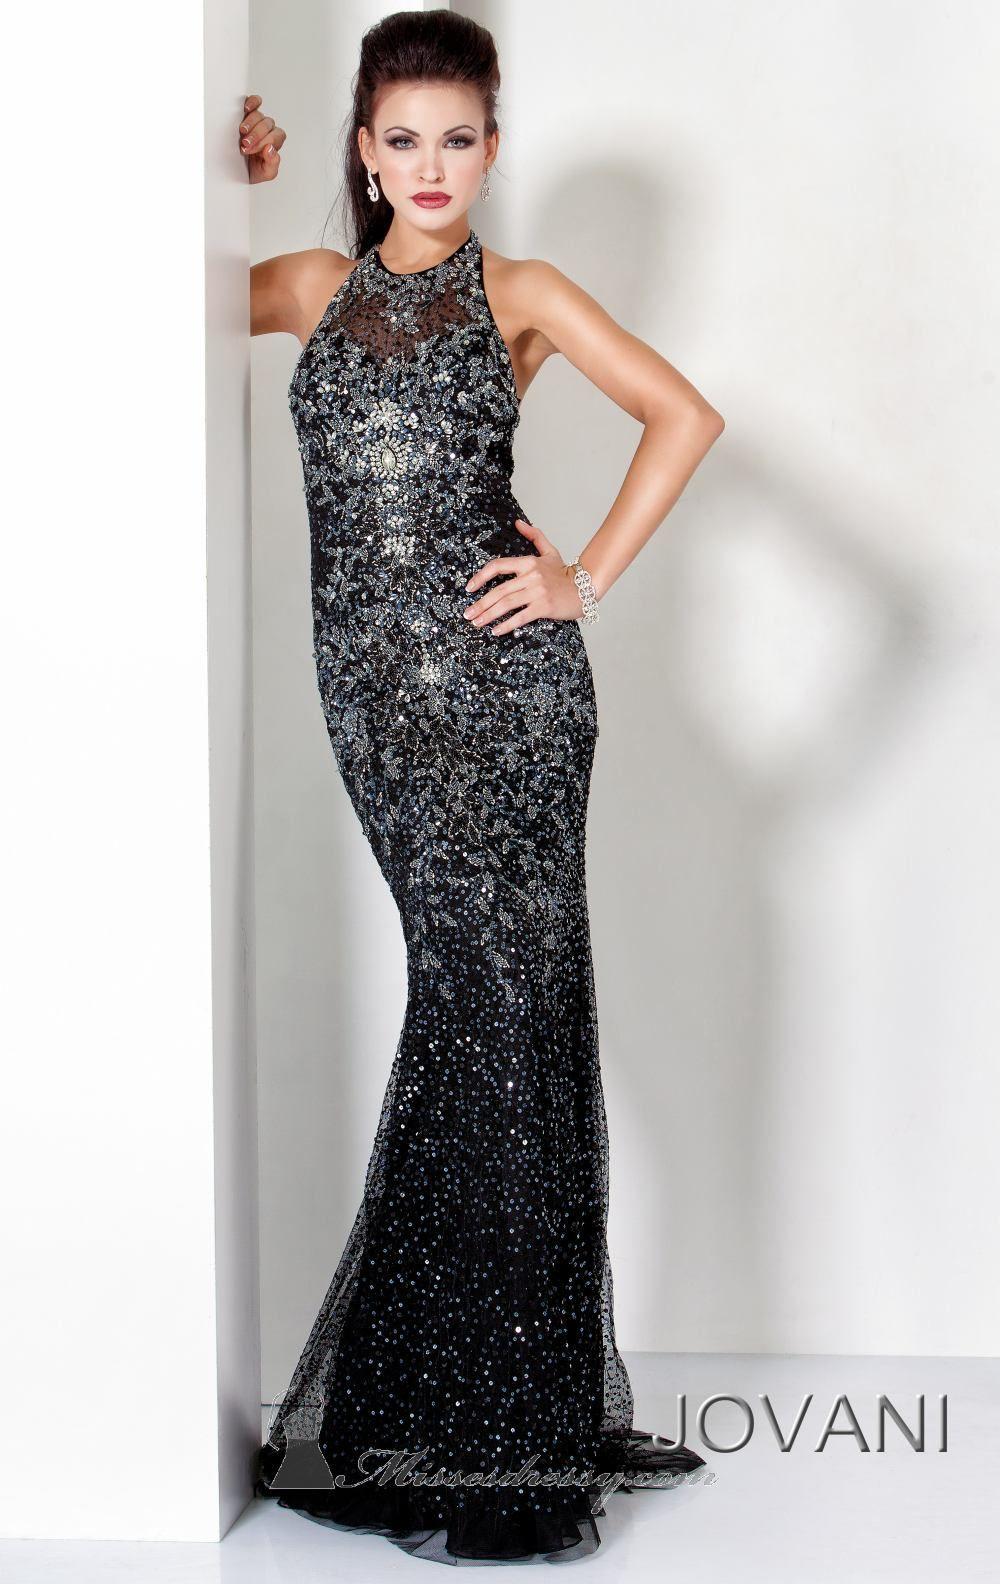 Jovani evening dresses pinterest exclusive collection